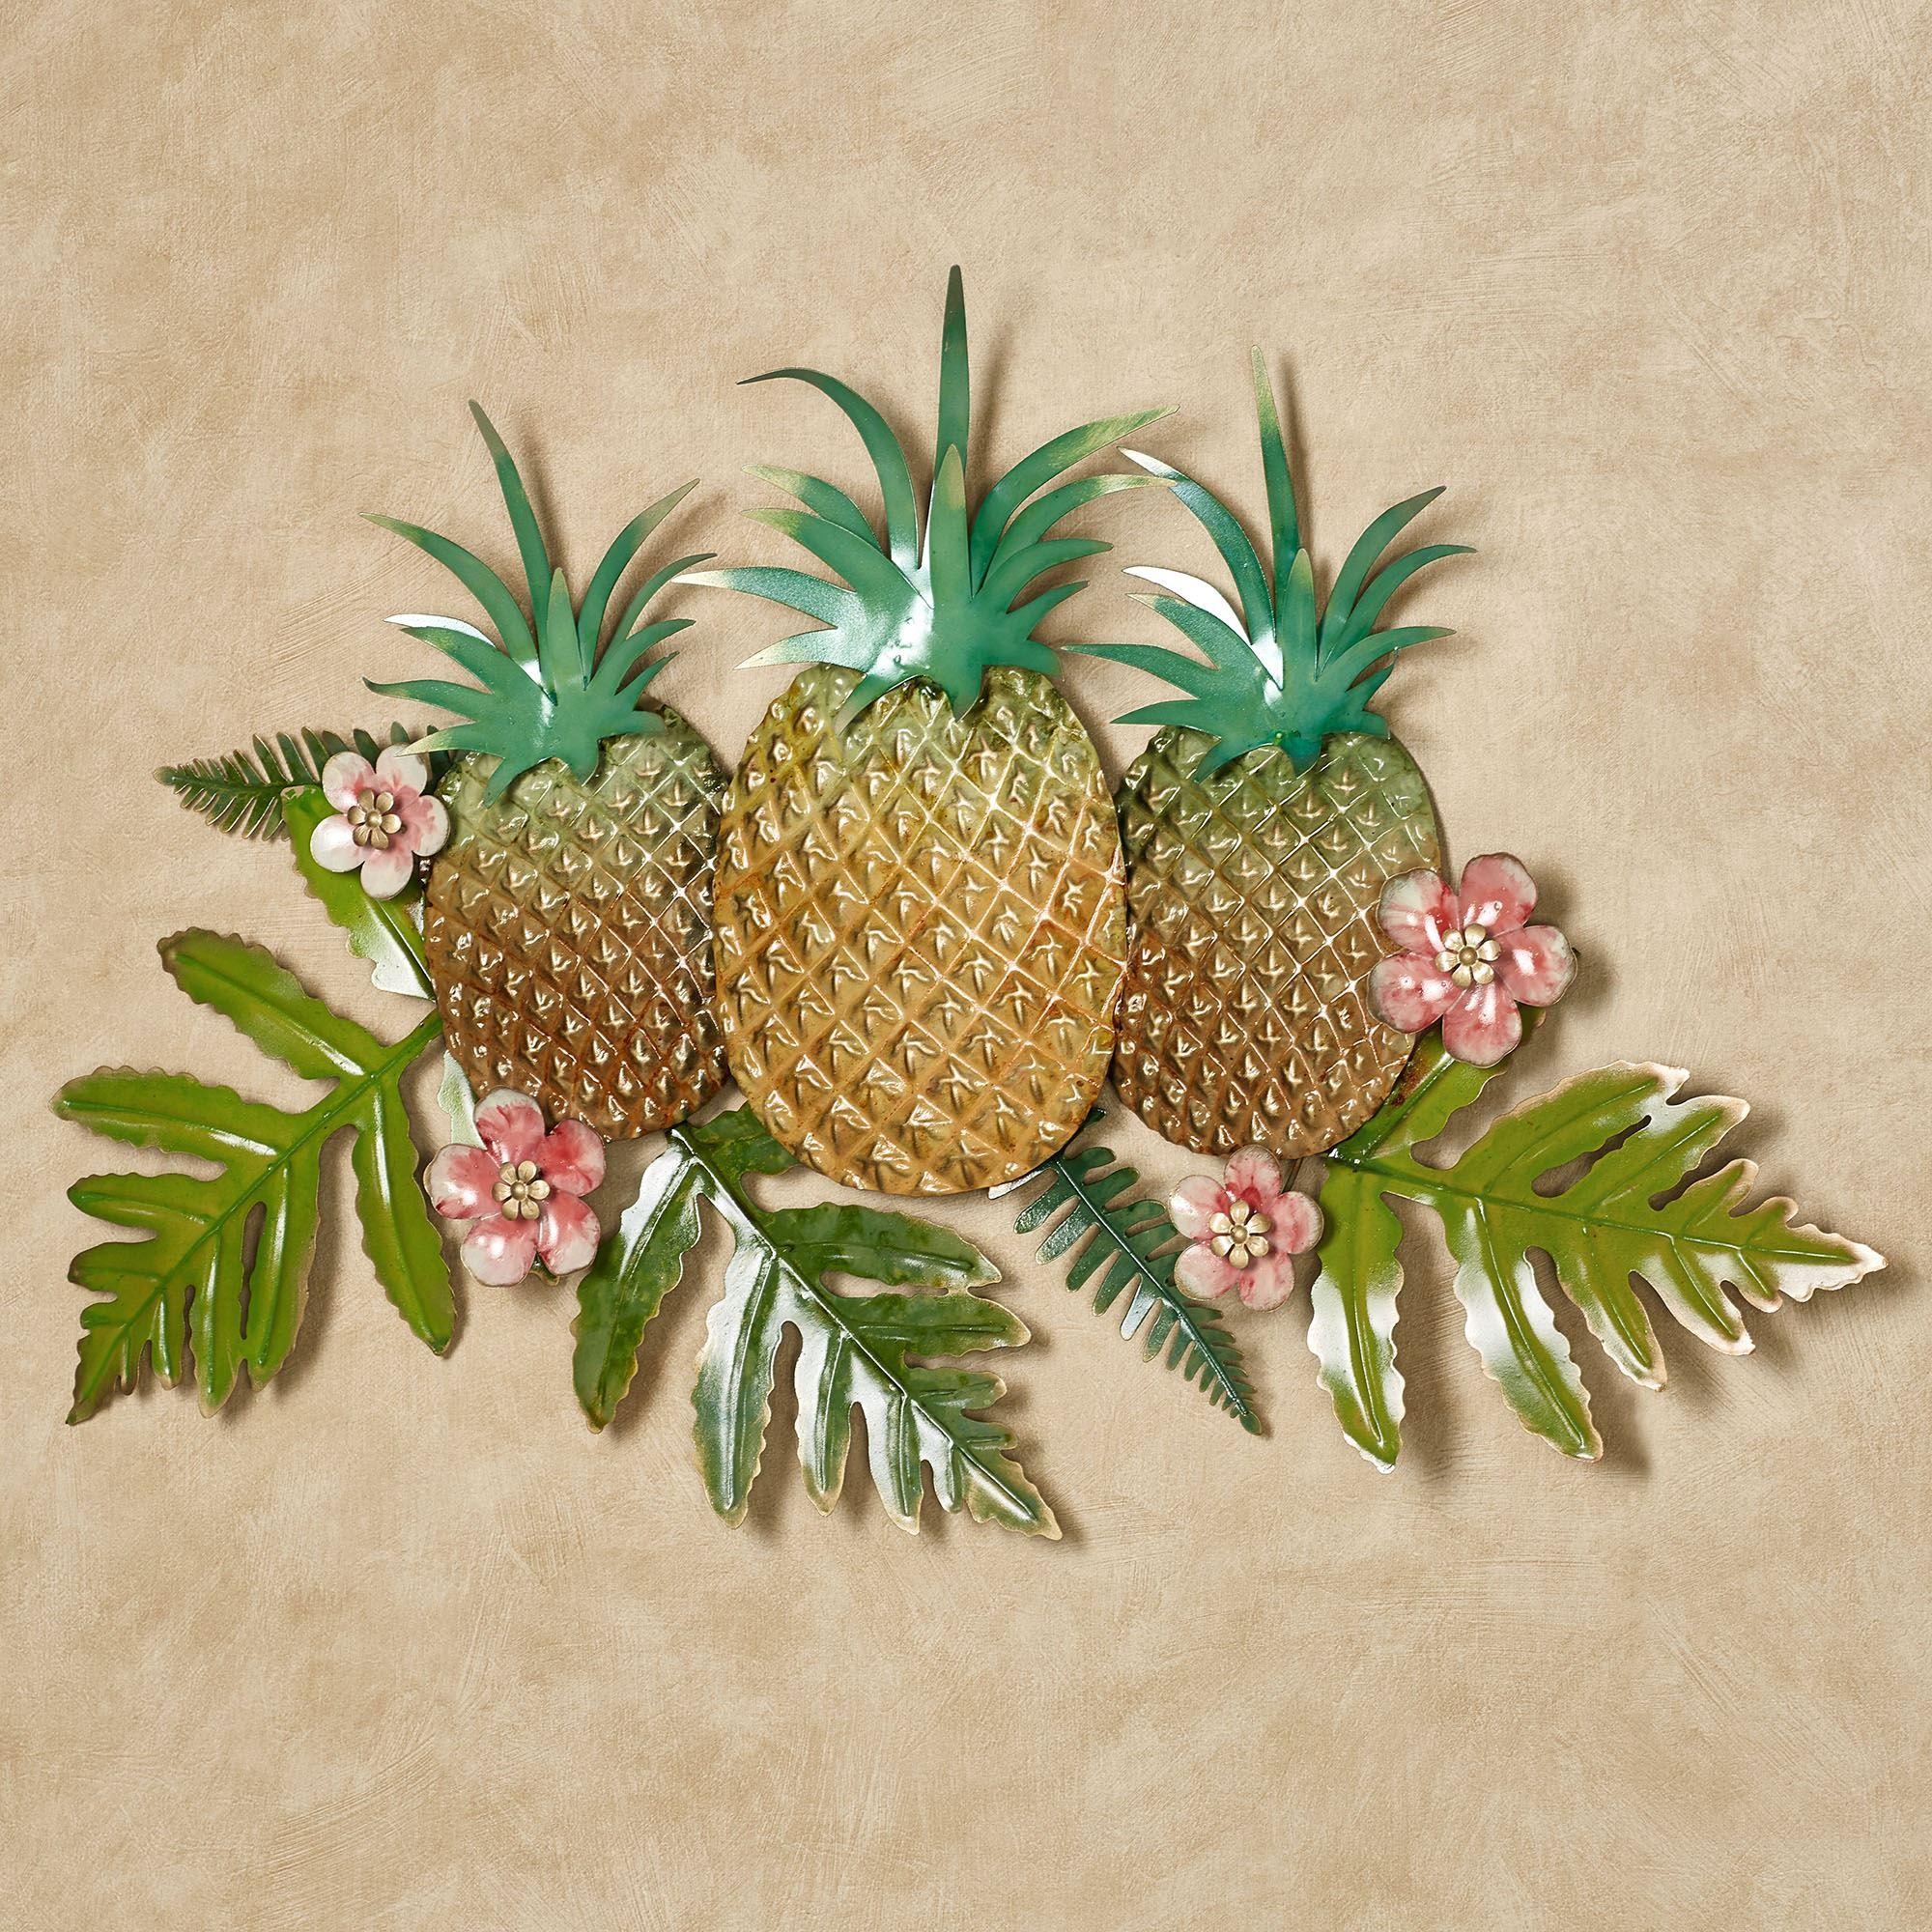 Pineapple Splendor Tropical Metal Wall Art Tropical Metal Wall Art Tropical Bedroom Decor Tropical Home Decor